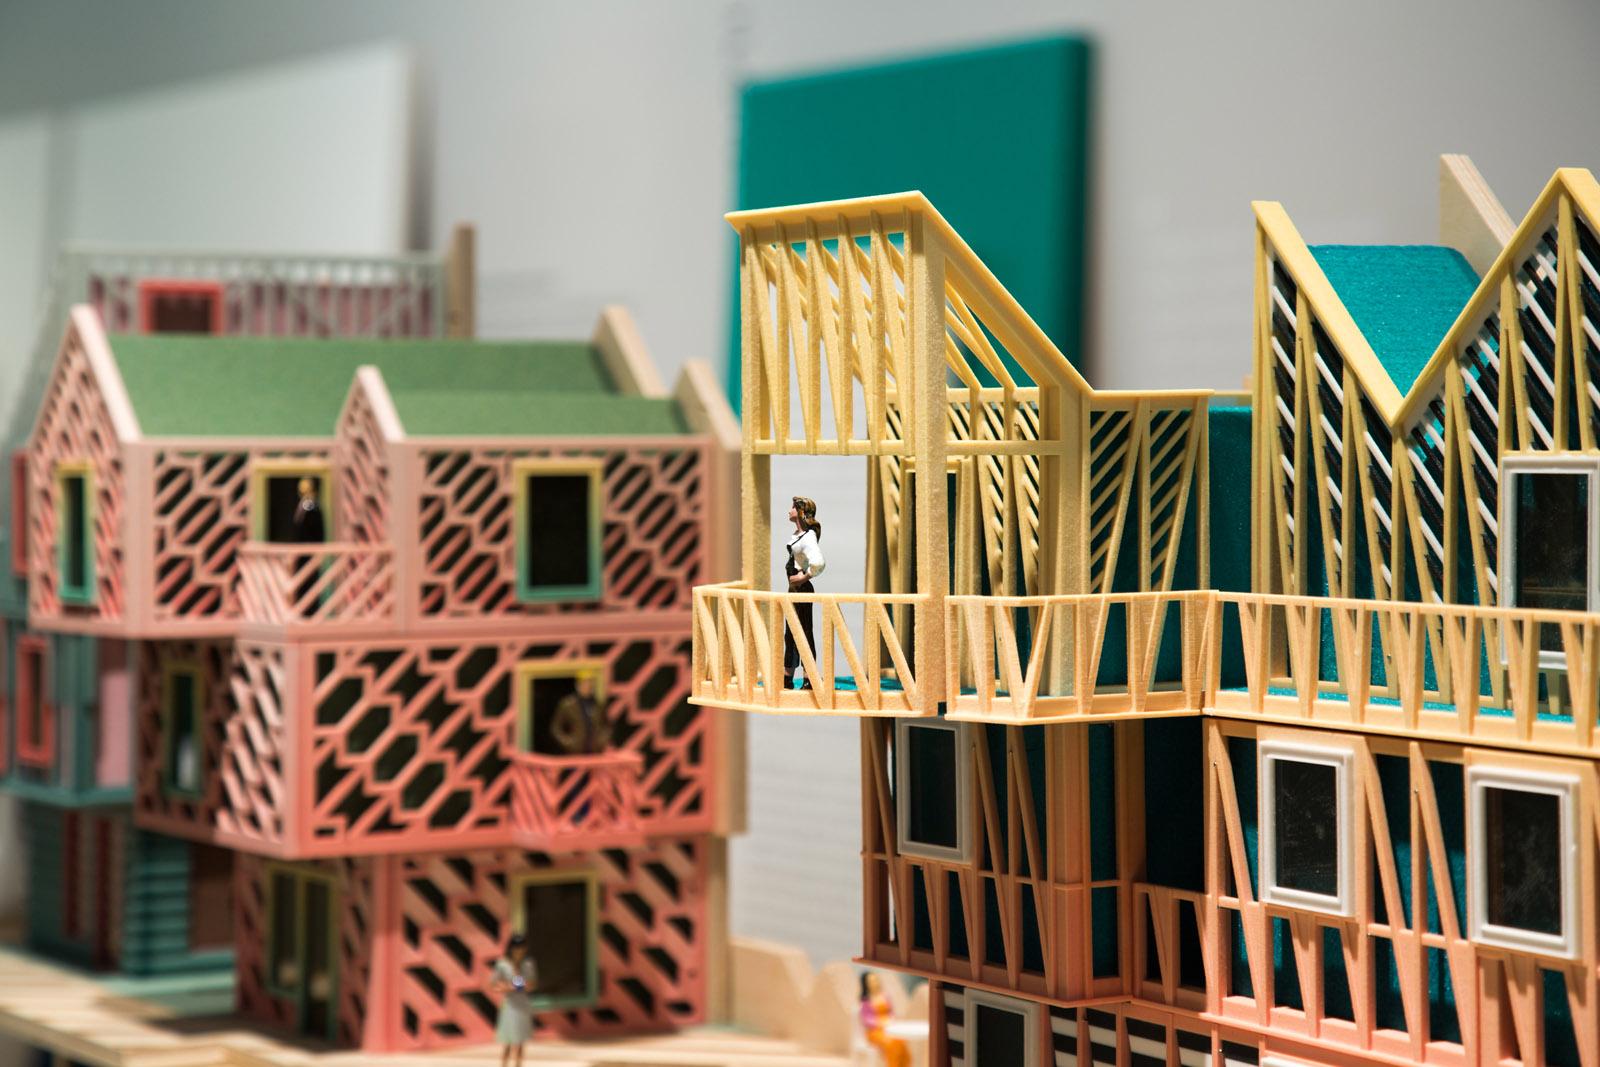 PROJECTS_OFFICE_design_museum_london_bridge_01.jpg